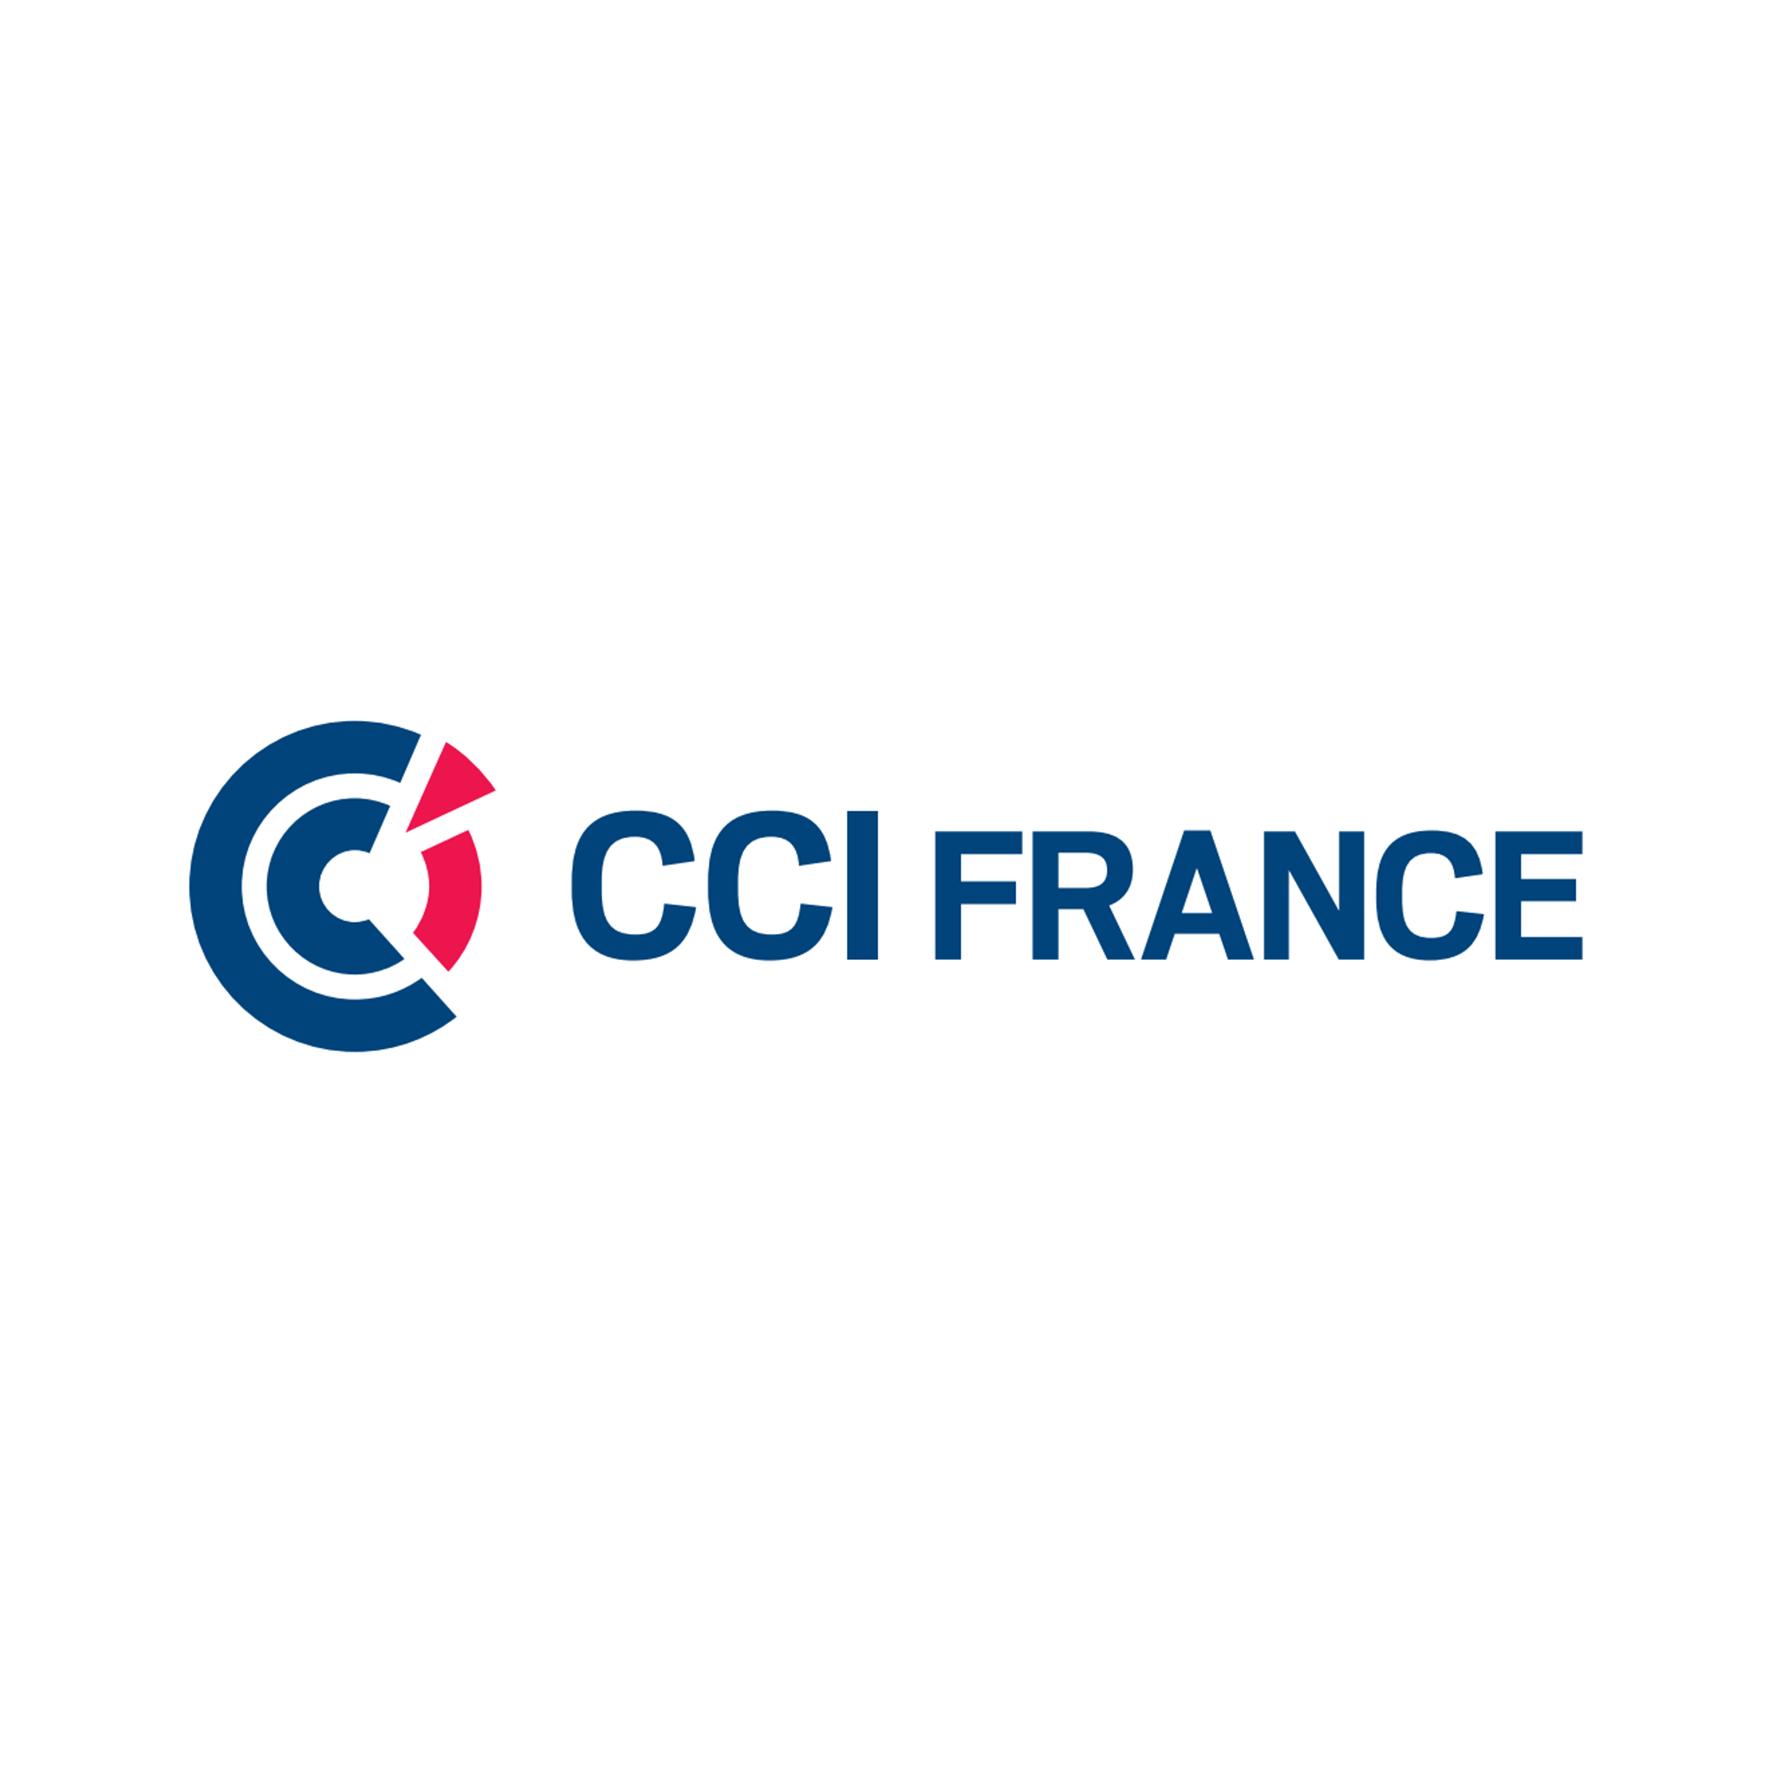 logo_CCI_France